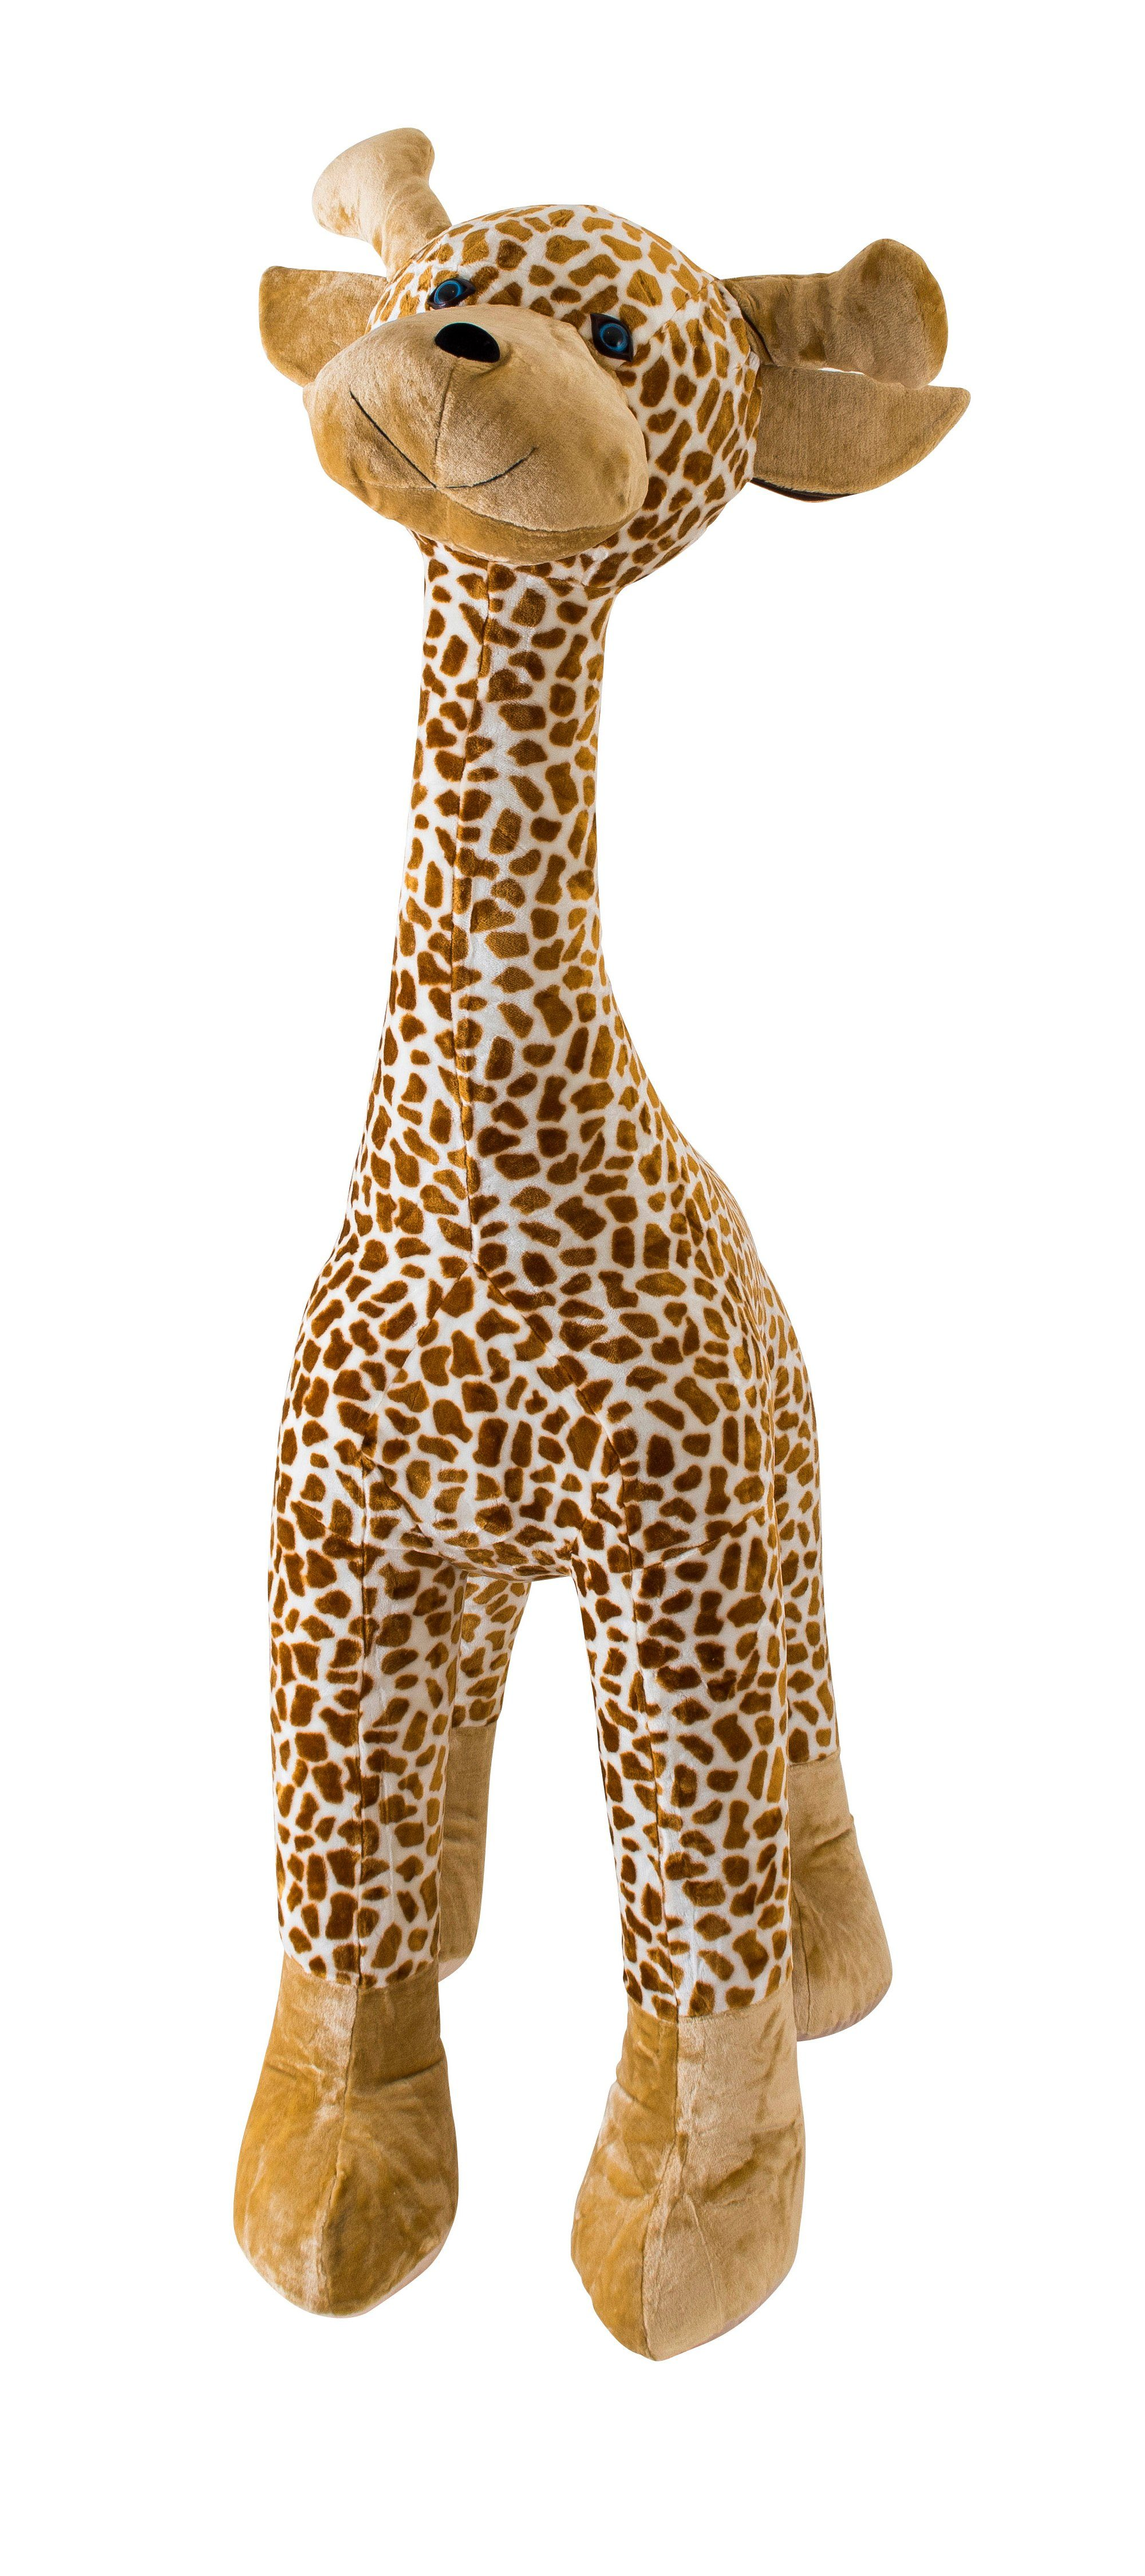 inflate-a-mals Großes Kuscheltier zum Aufblasen, Spielfreund Giraffe »My Giraffe Pal«